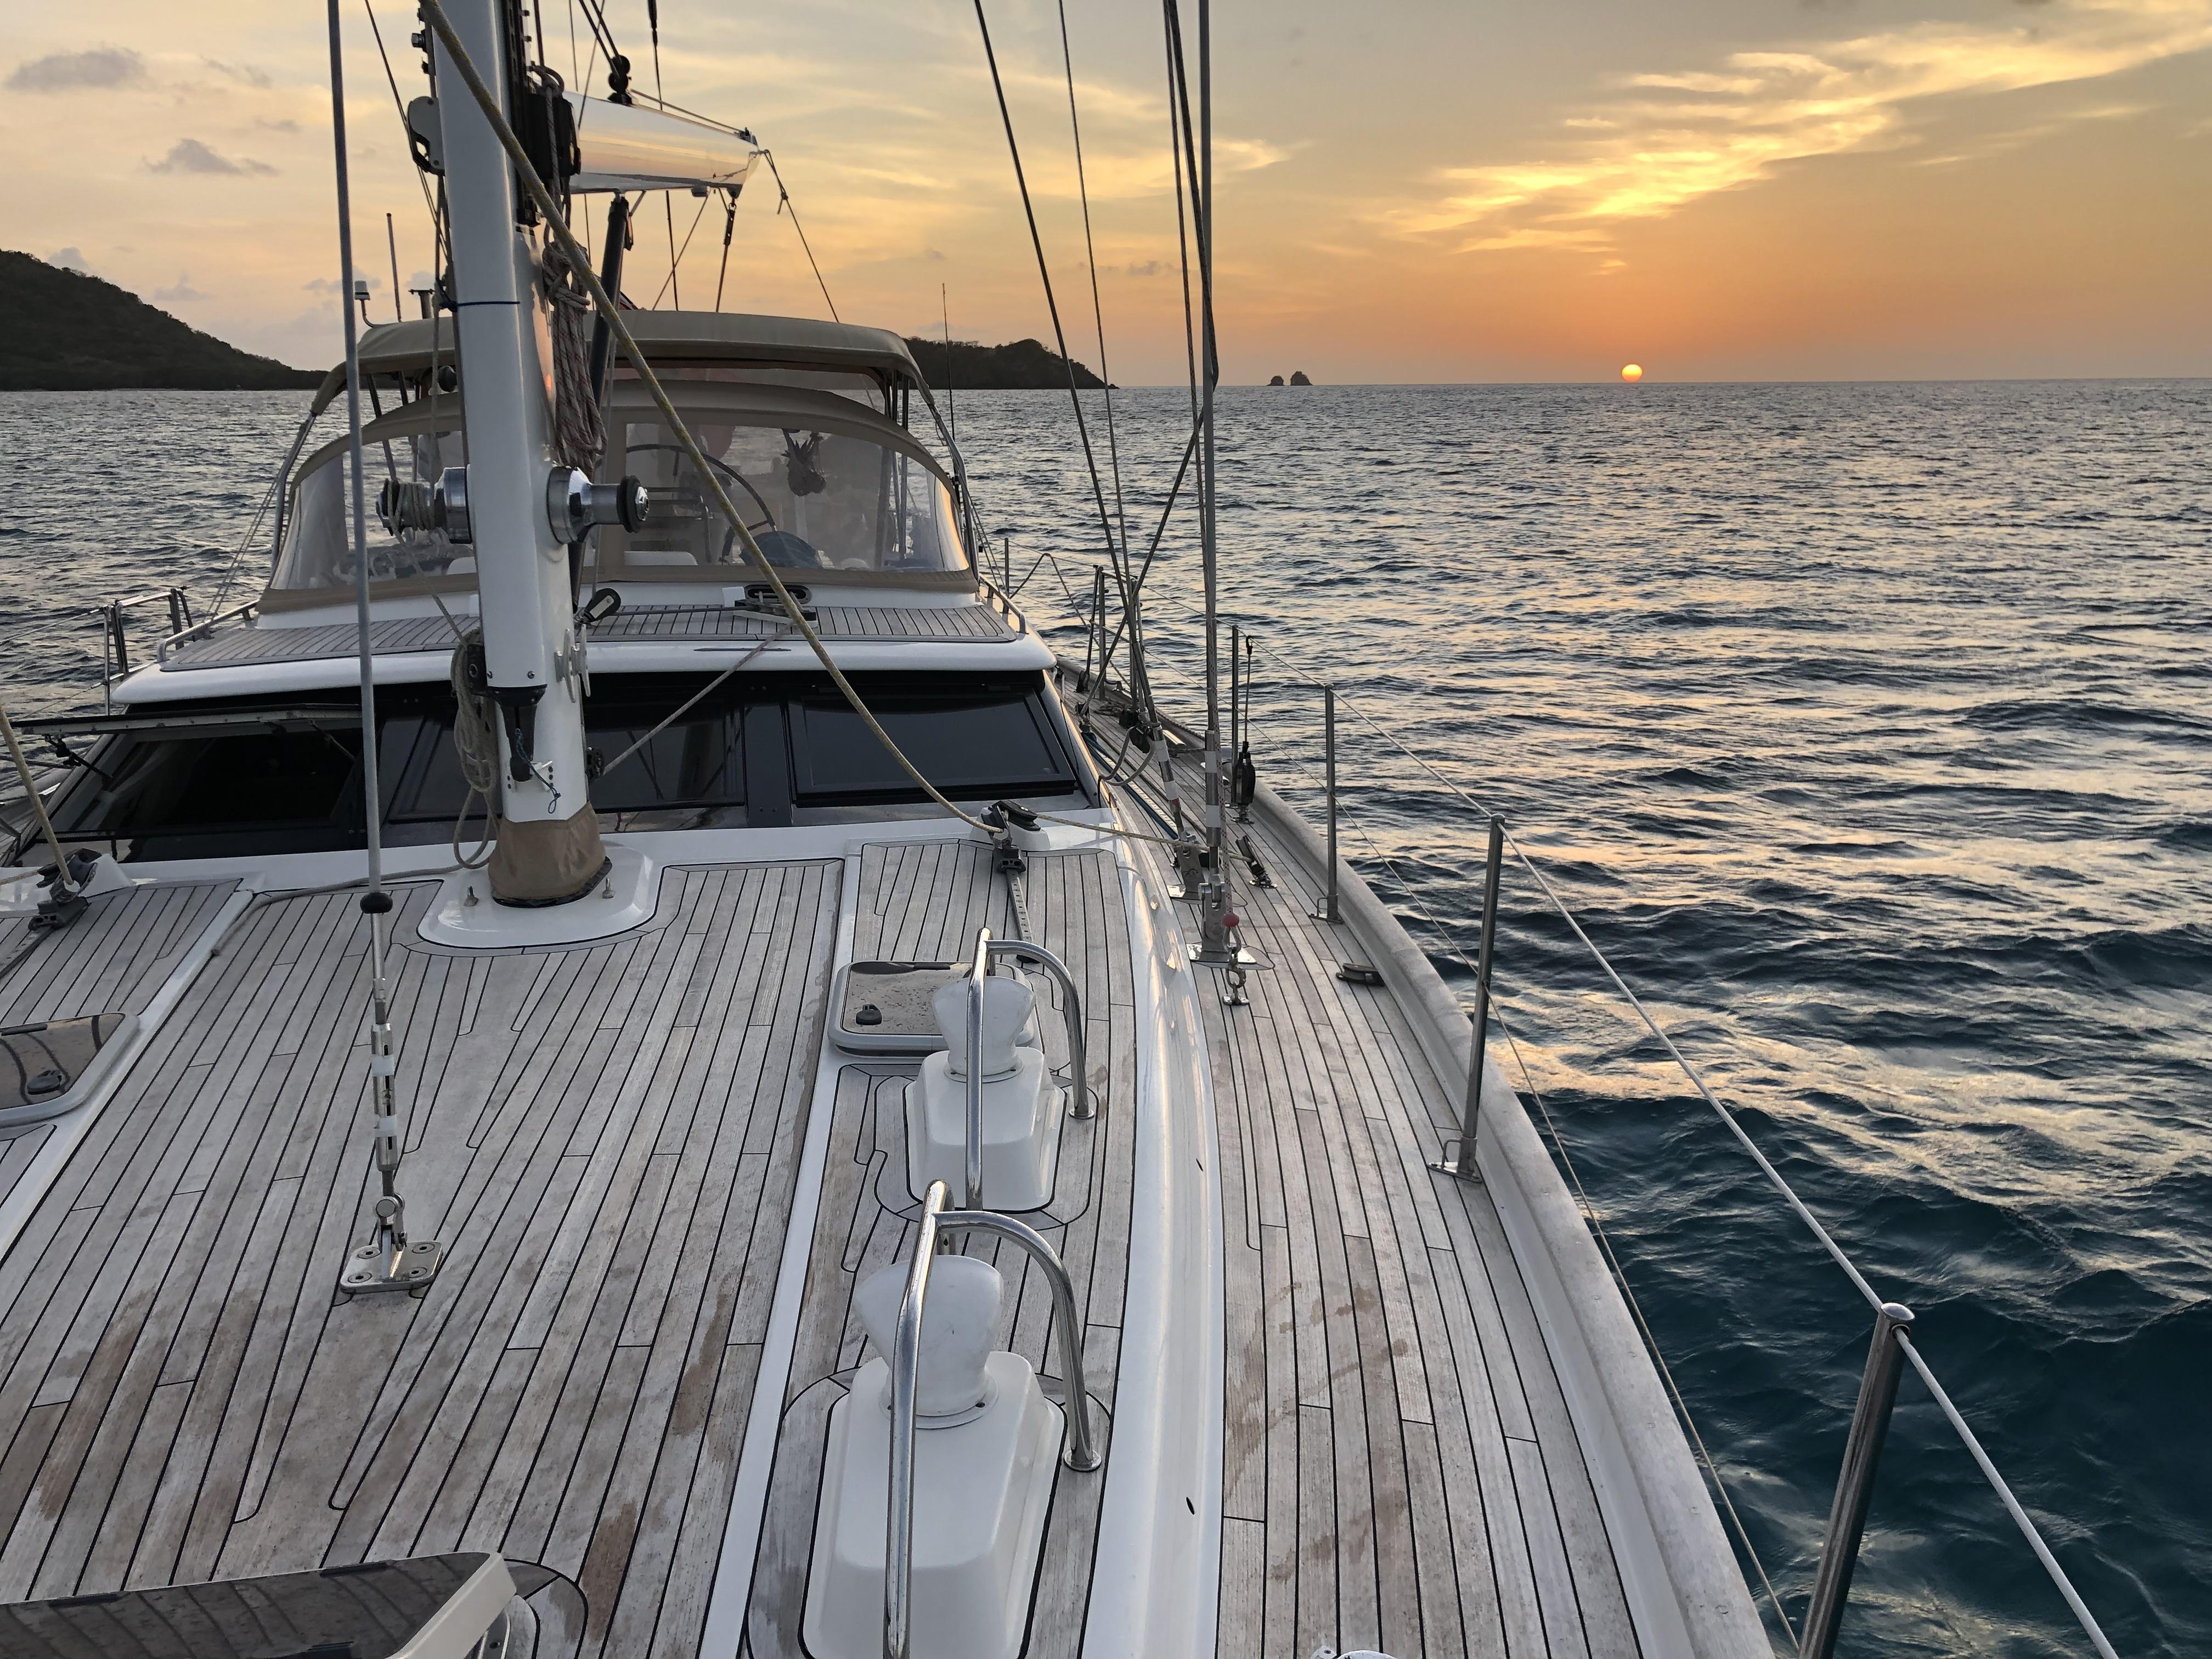 Sunset at Sandy Island